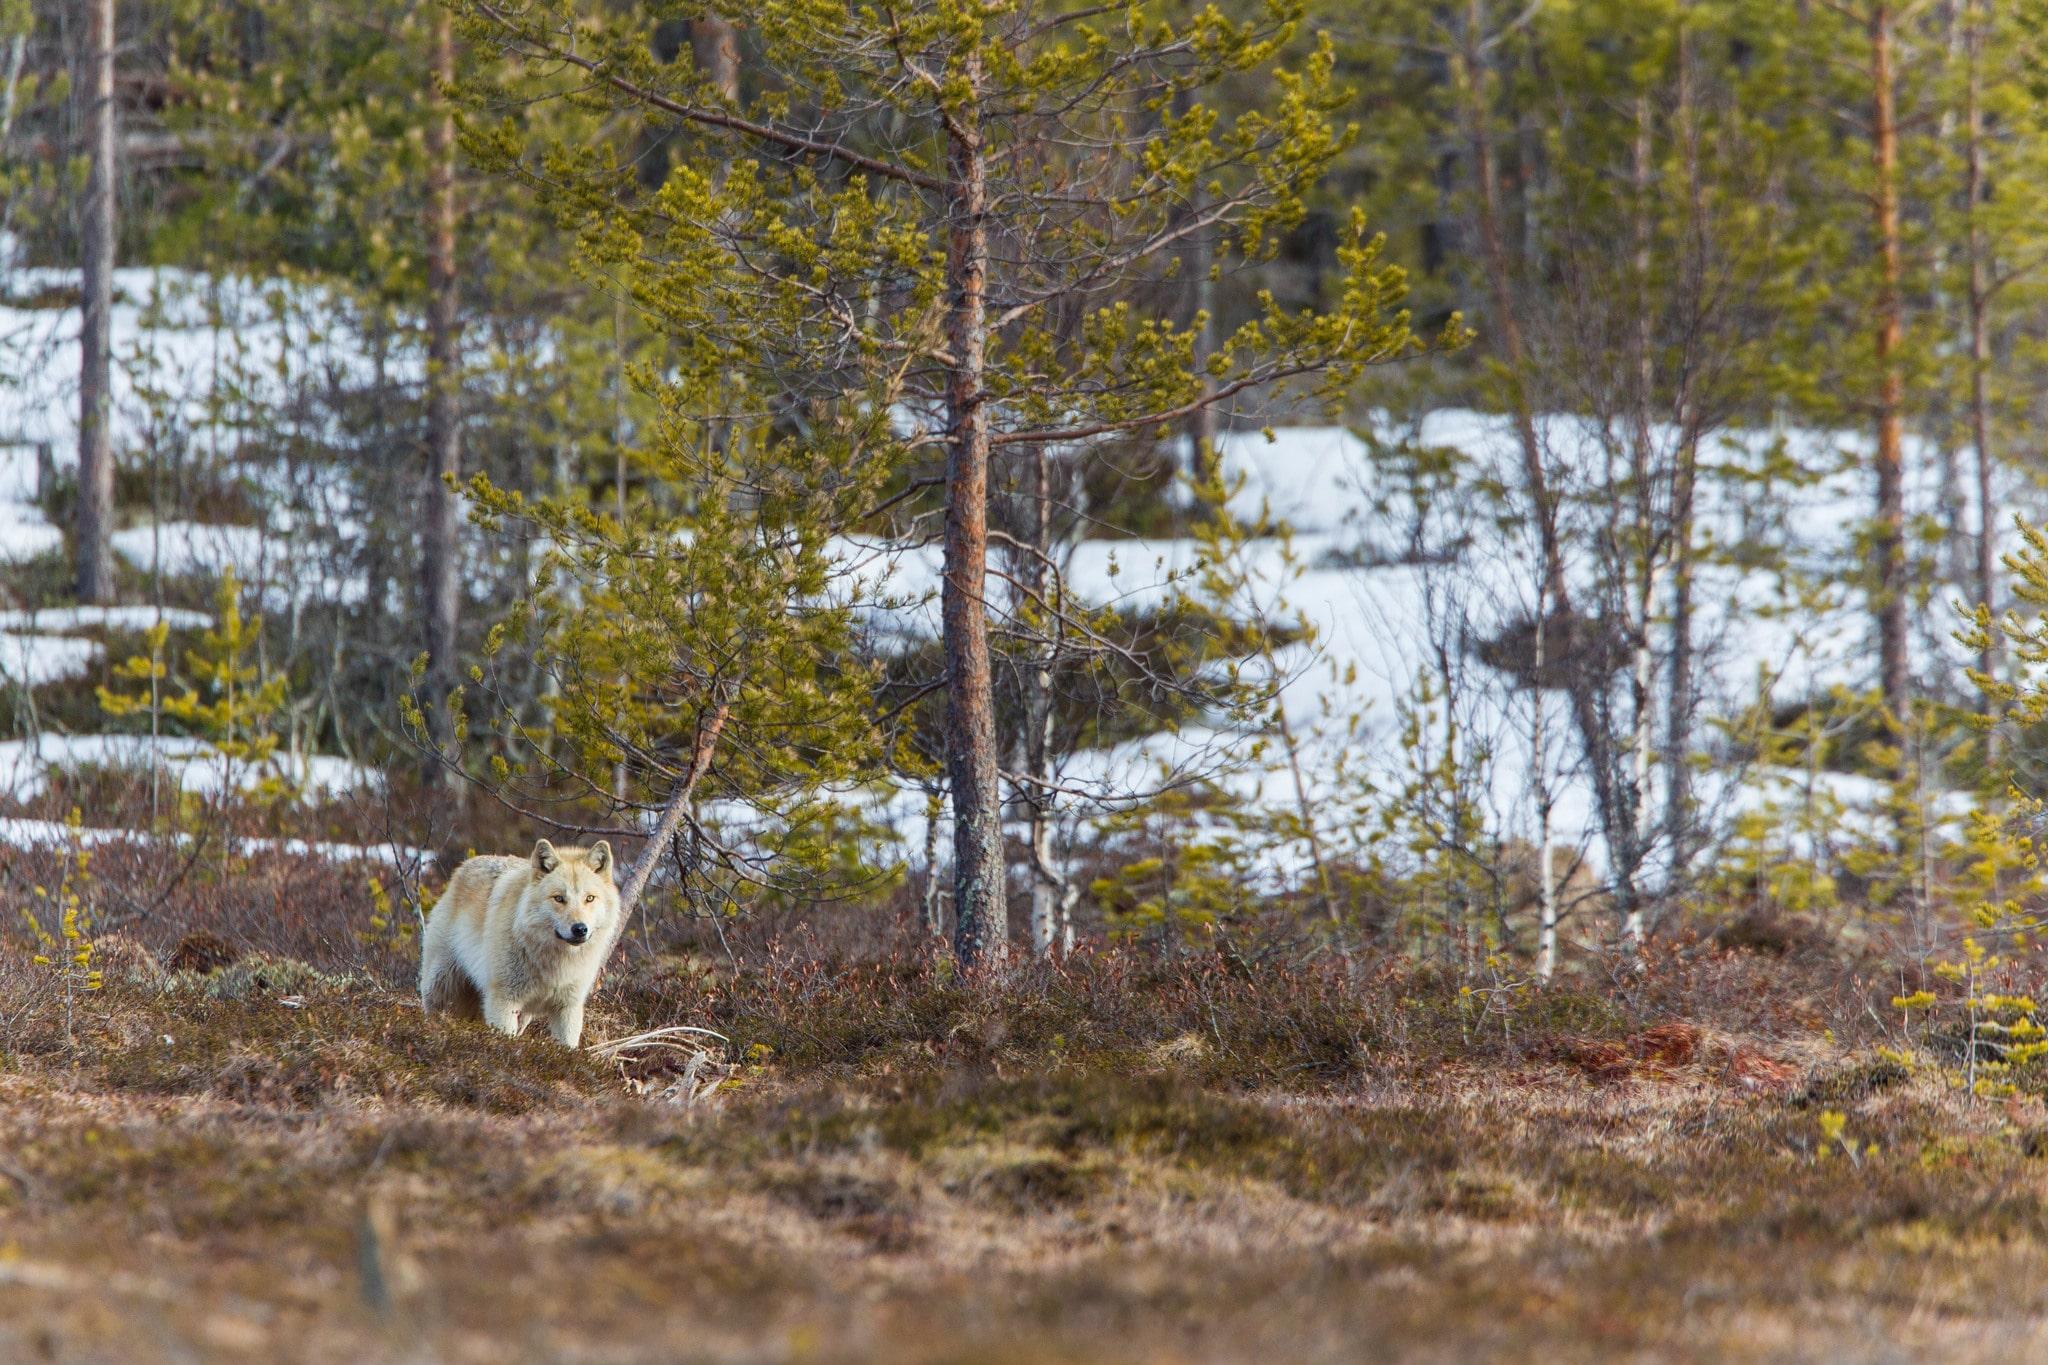 Jakten på varg i Finland inleds nu på lördag. Foto: Kjell-Erik Moseid